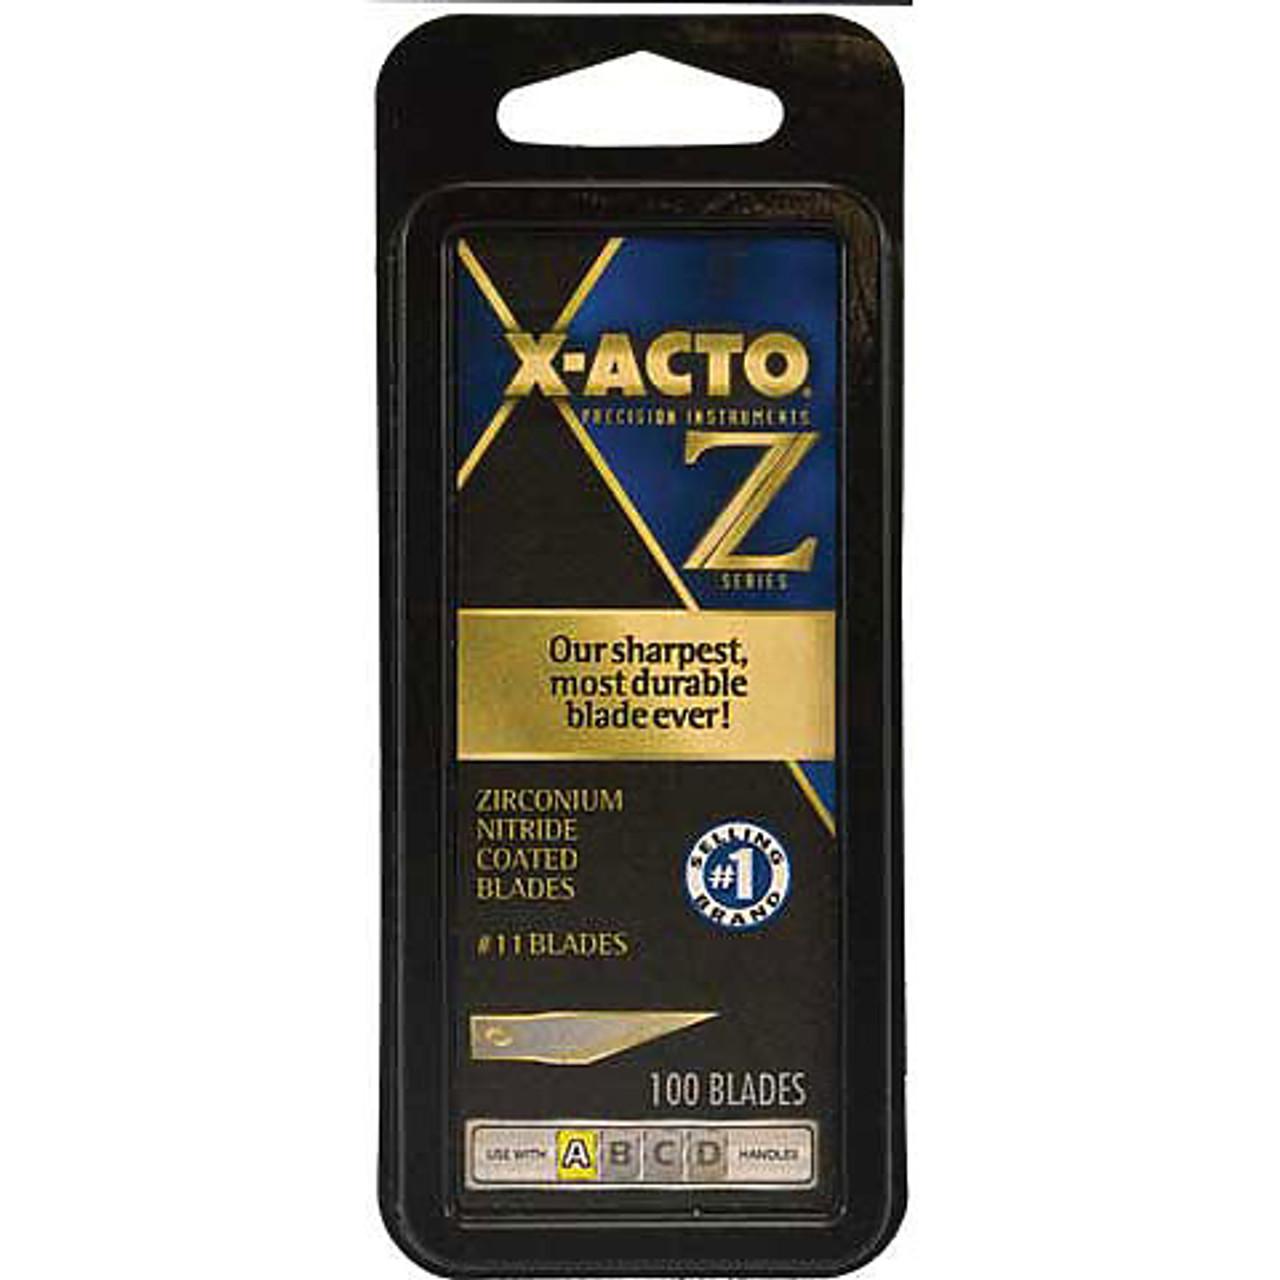 X-ACTO Z-Series #11 Blades